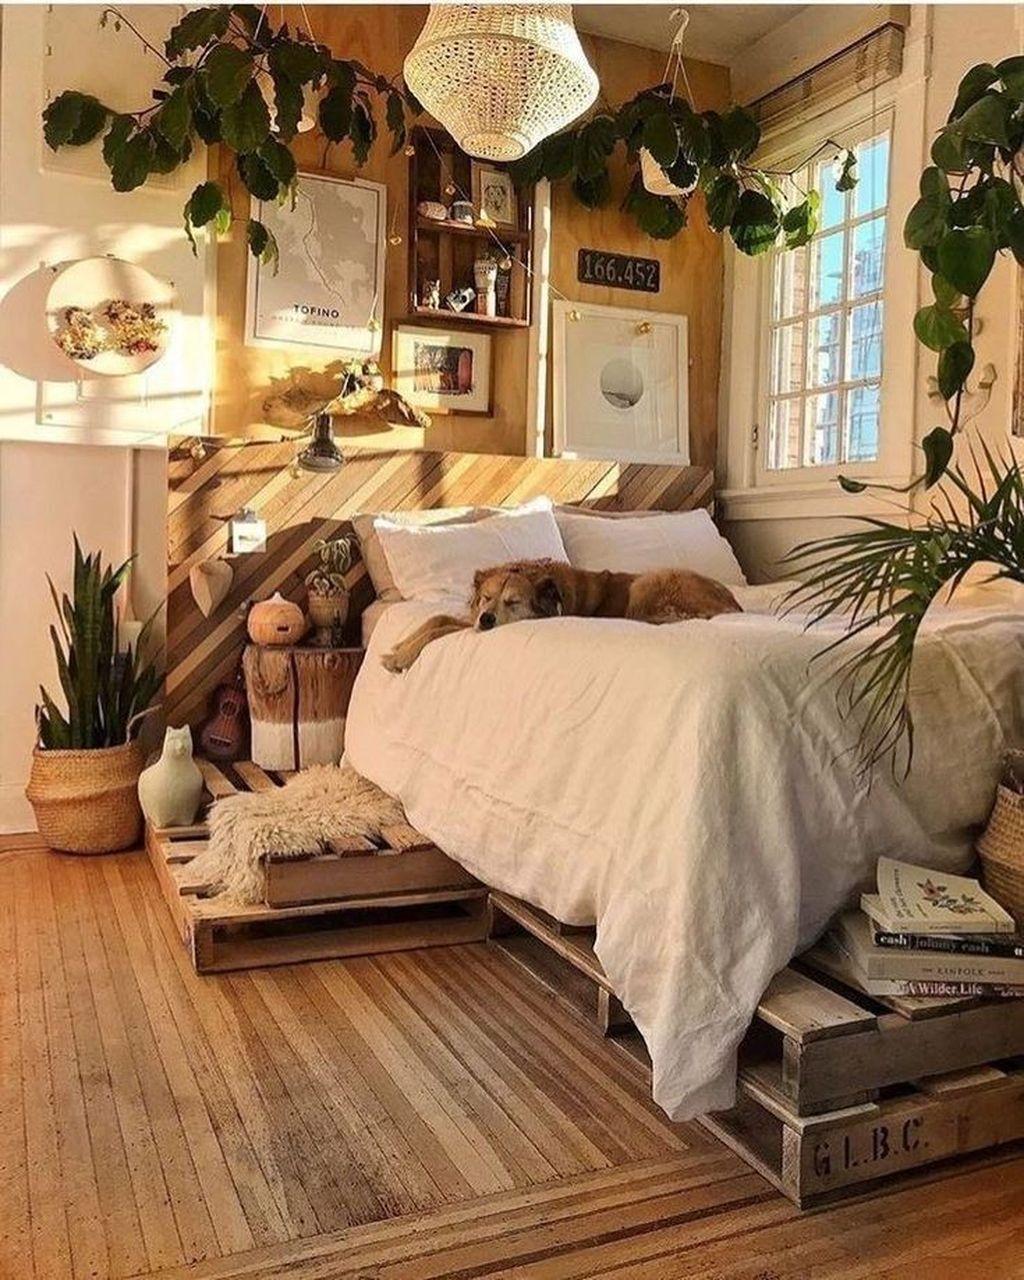 Stunning Bedding Ideas For Cozy Bedroom 19